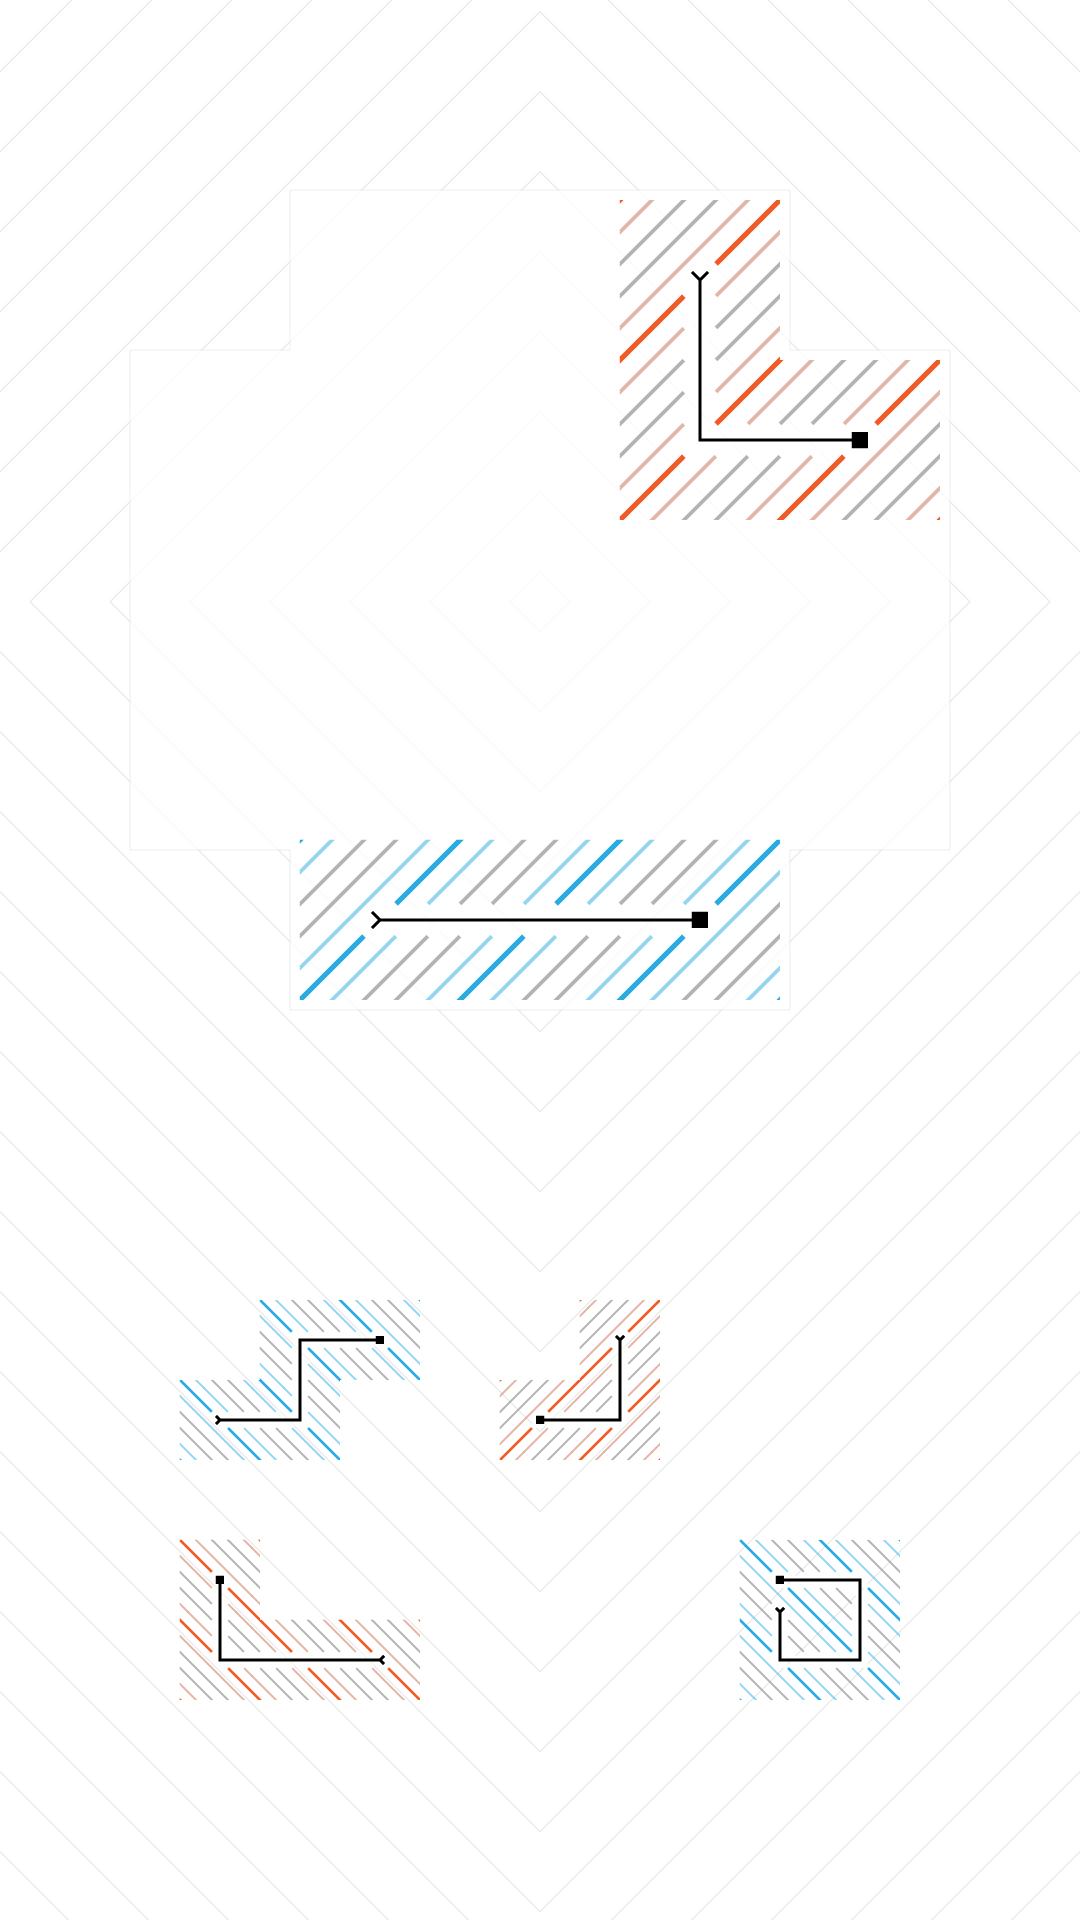 level-appearance-9.jpg